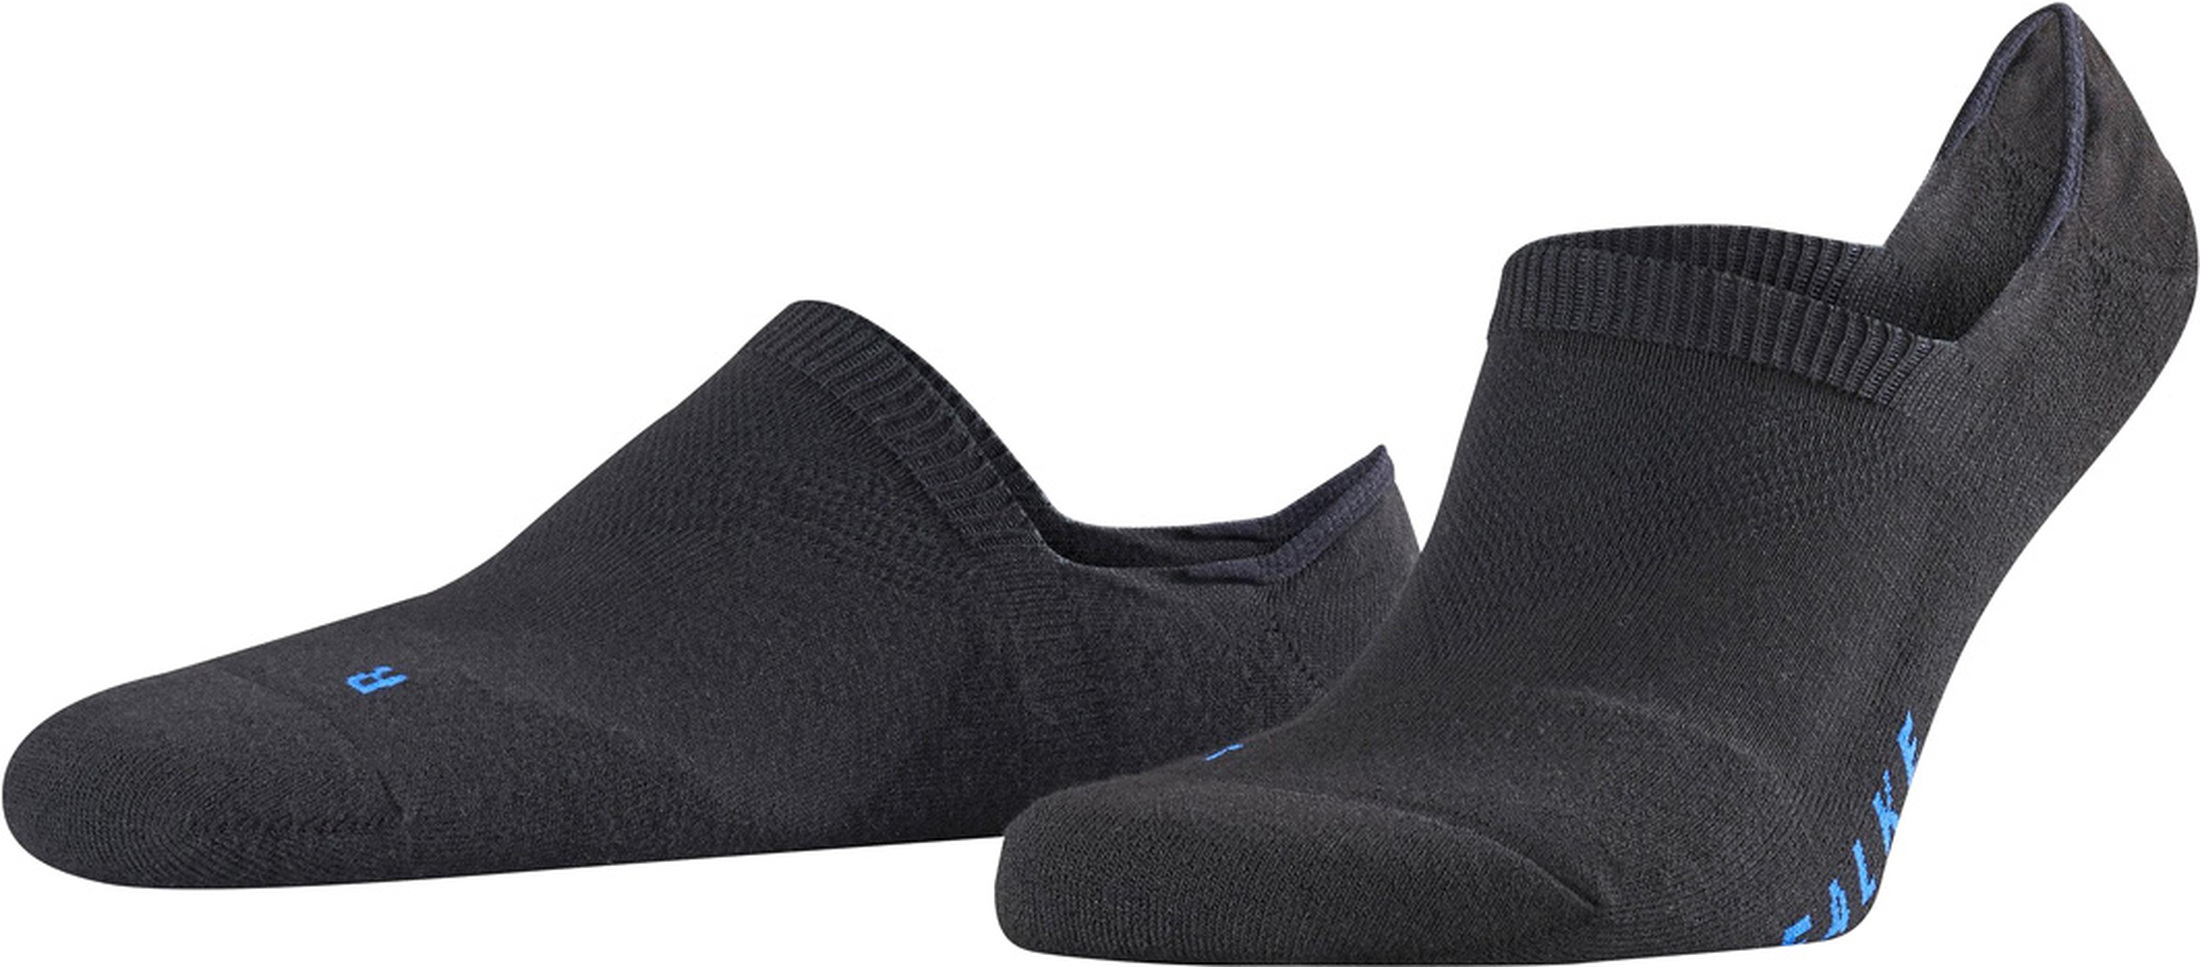 Falke Cool Kick Sock Black